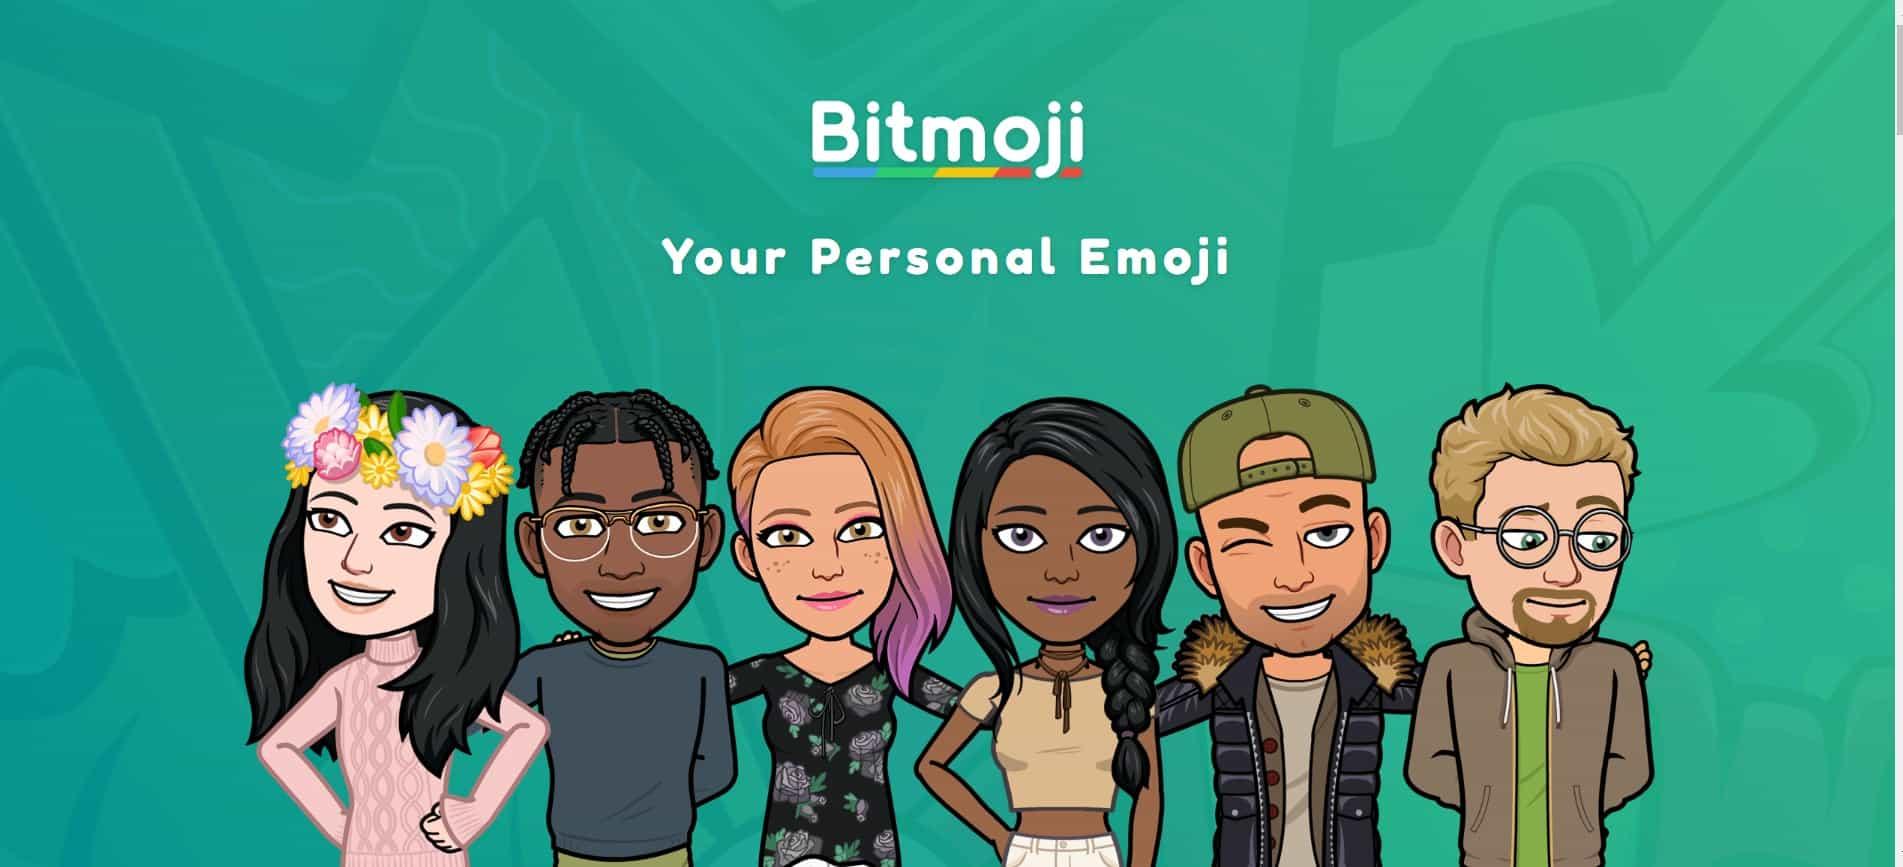 Bitmoji - Amoji APP for Android FREE